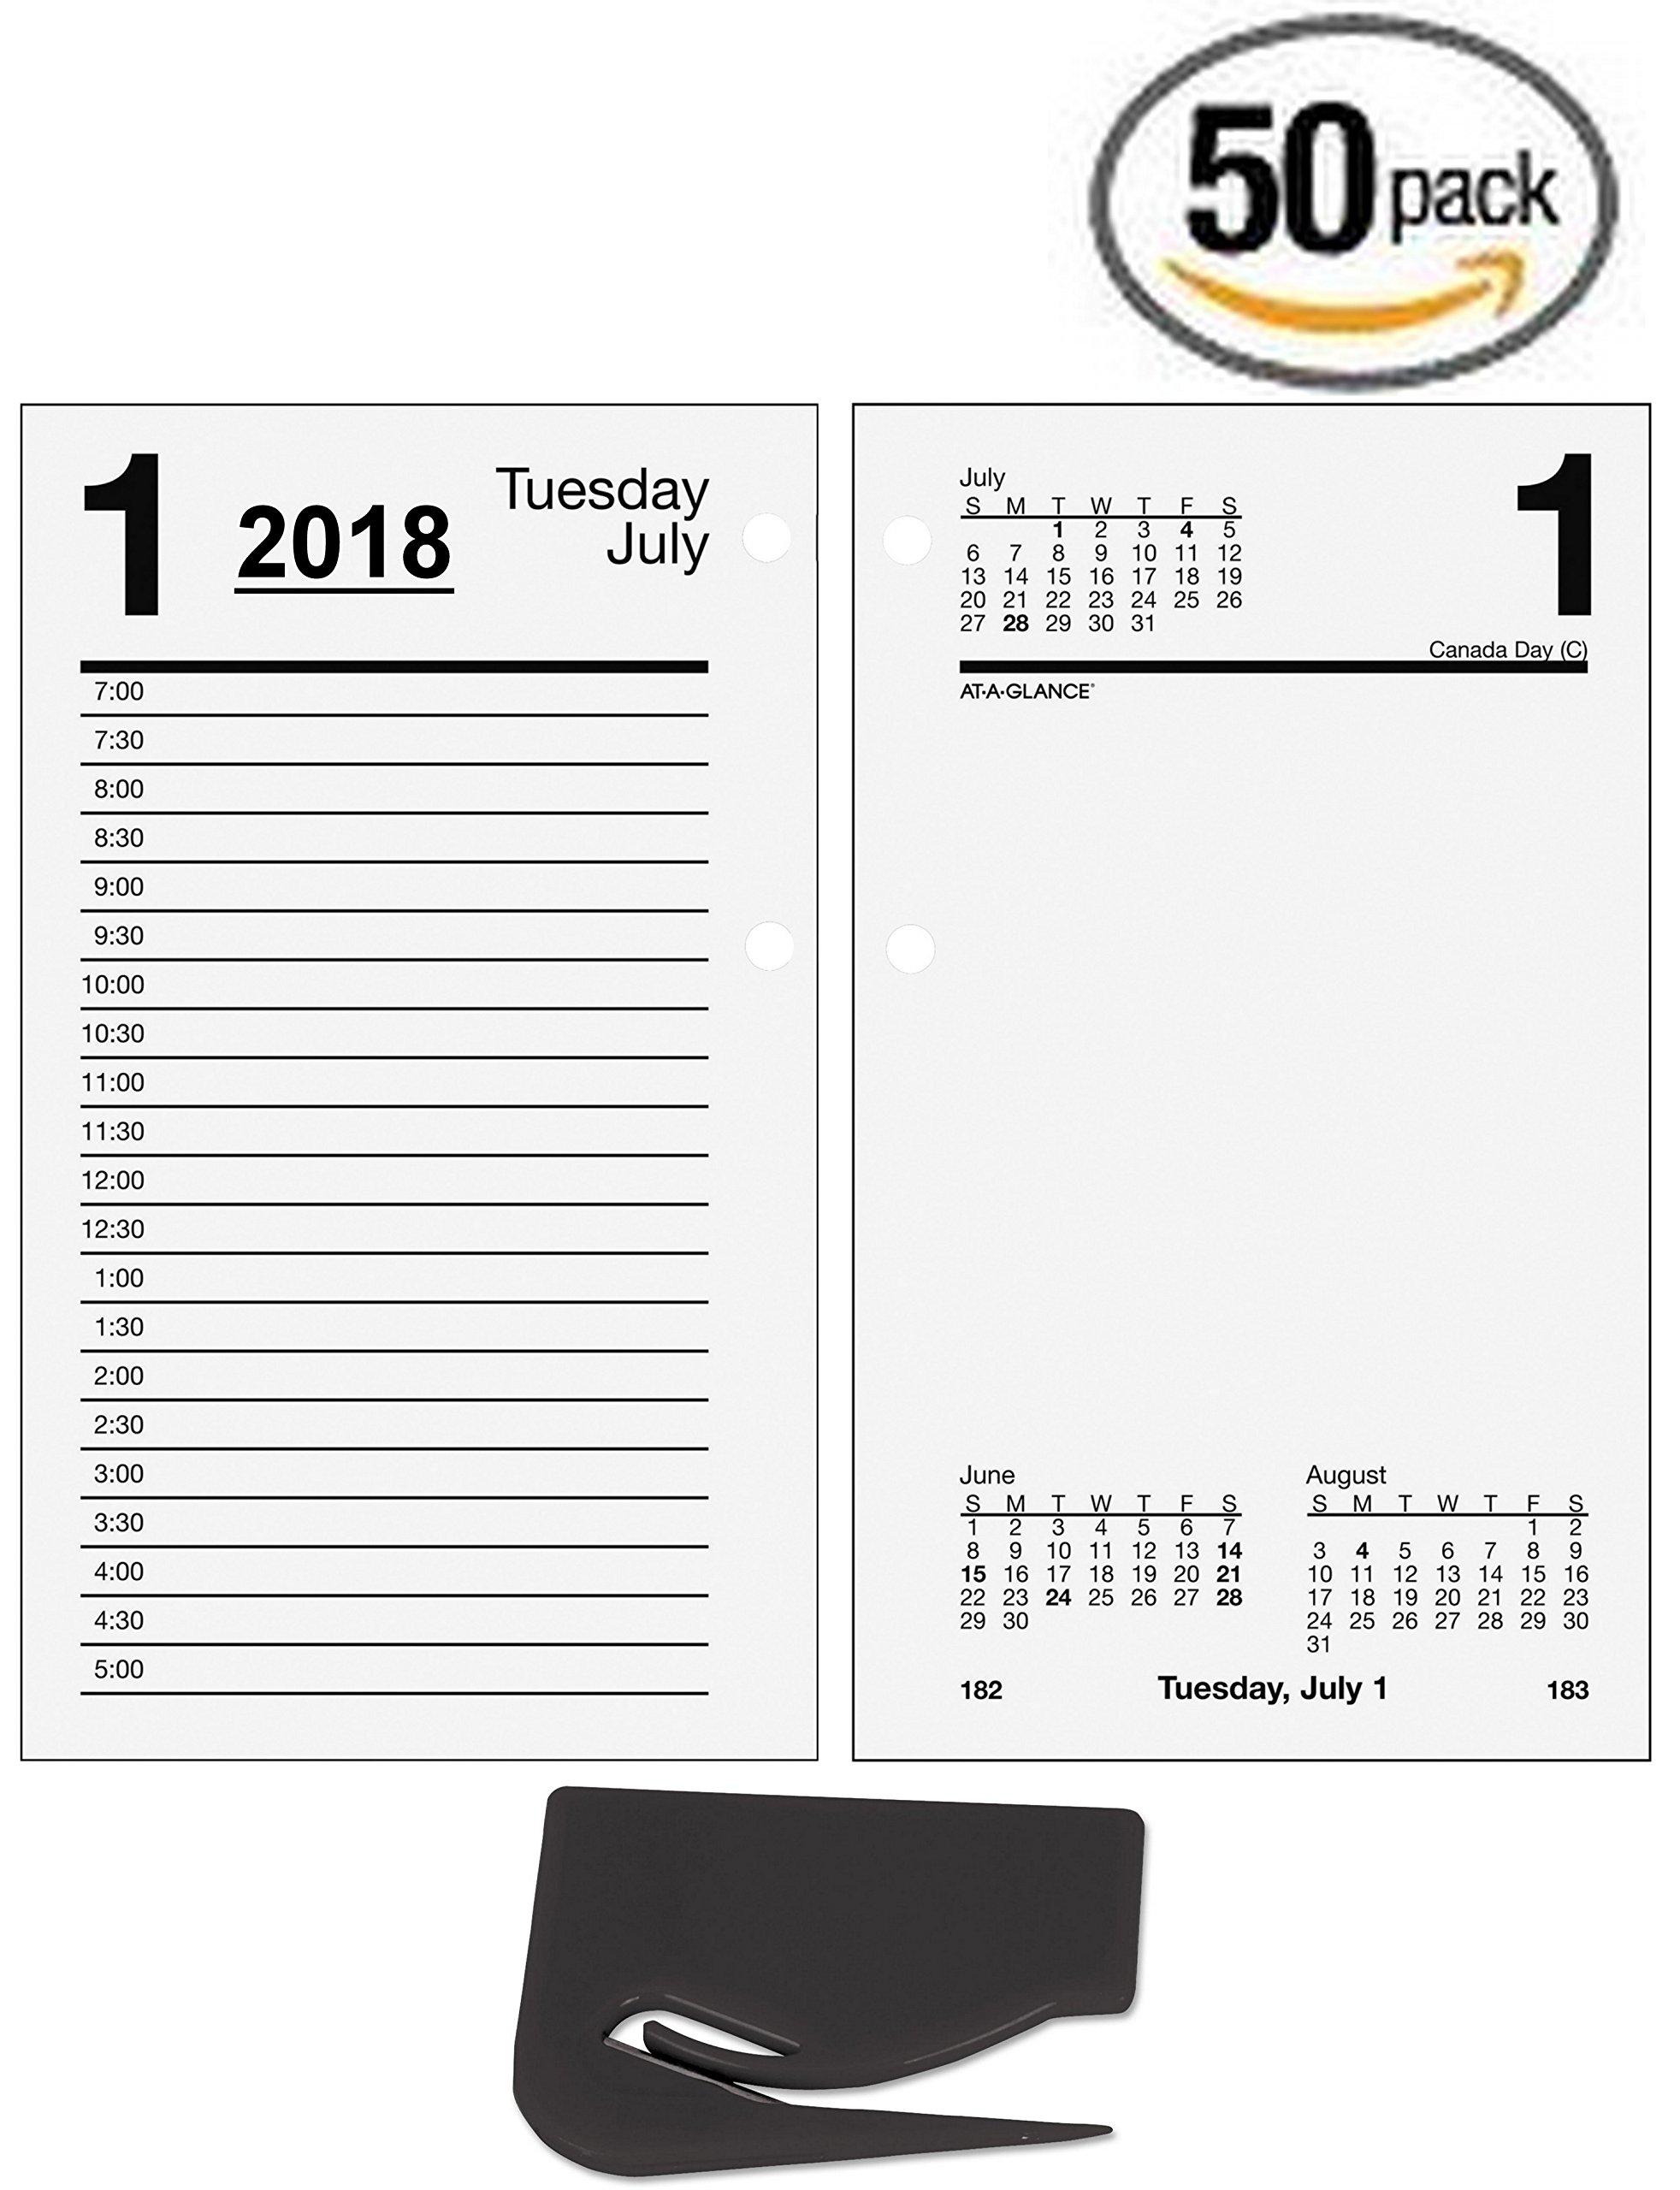 50 Pack Bundle AT-A-GLANCE Daily Desk Calendar Refill, January 2018 - December 2018, 3-1/2'' x 6'', Loose Leaf (E71750) plus a Bonus Letter Opener (50)